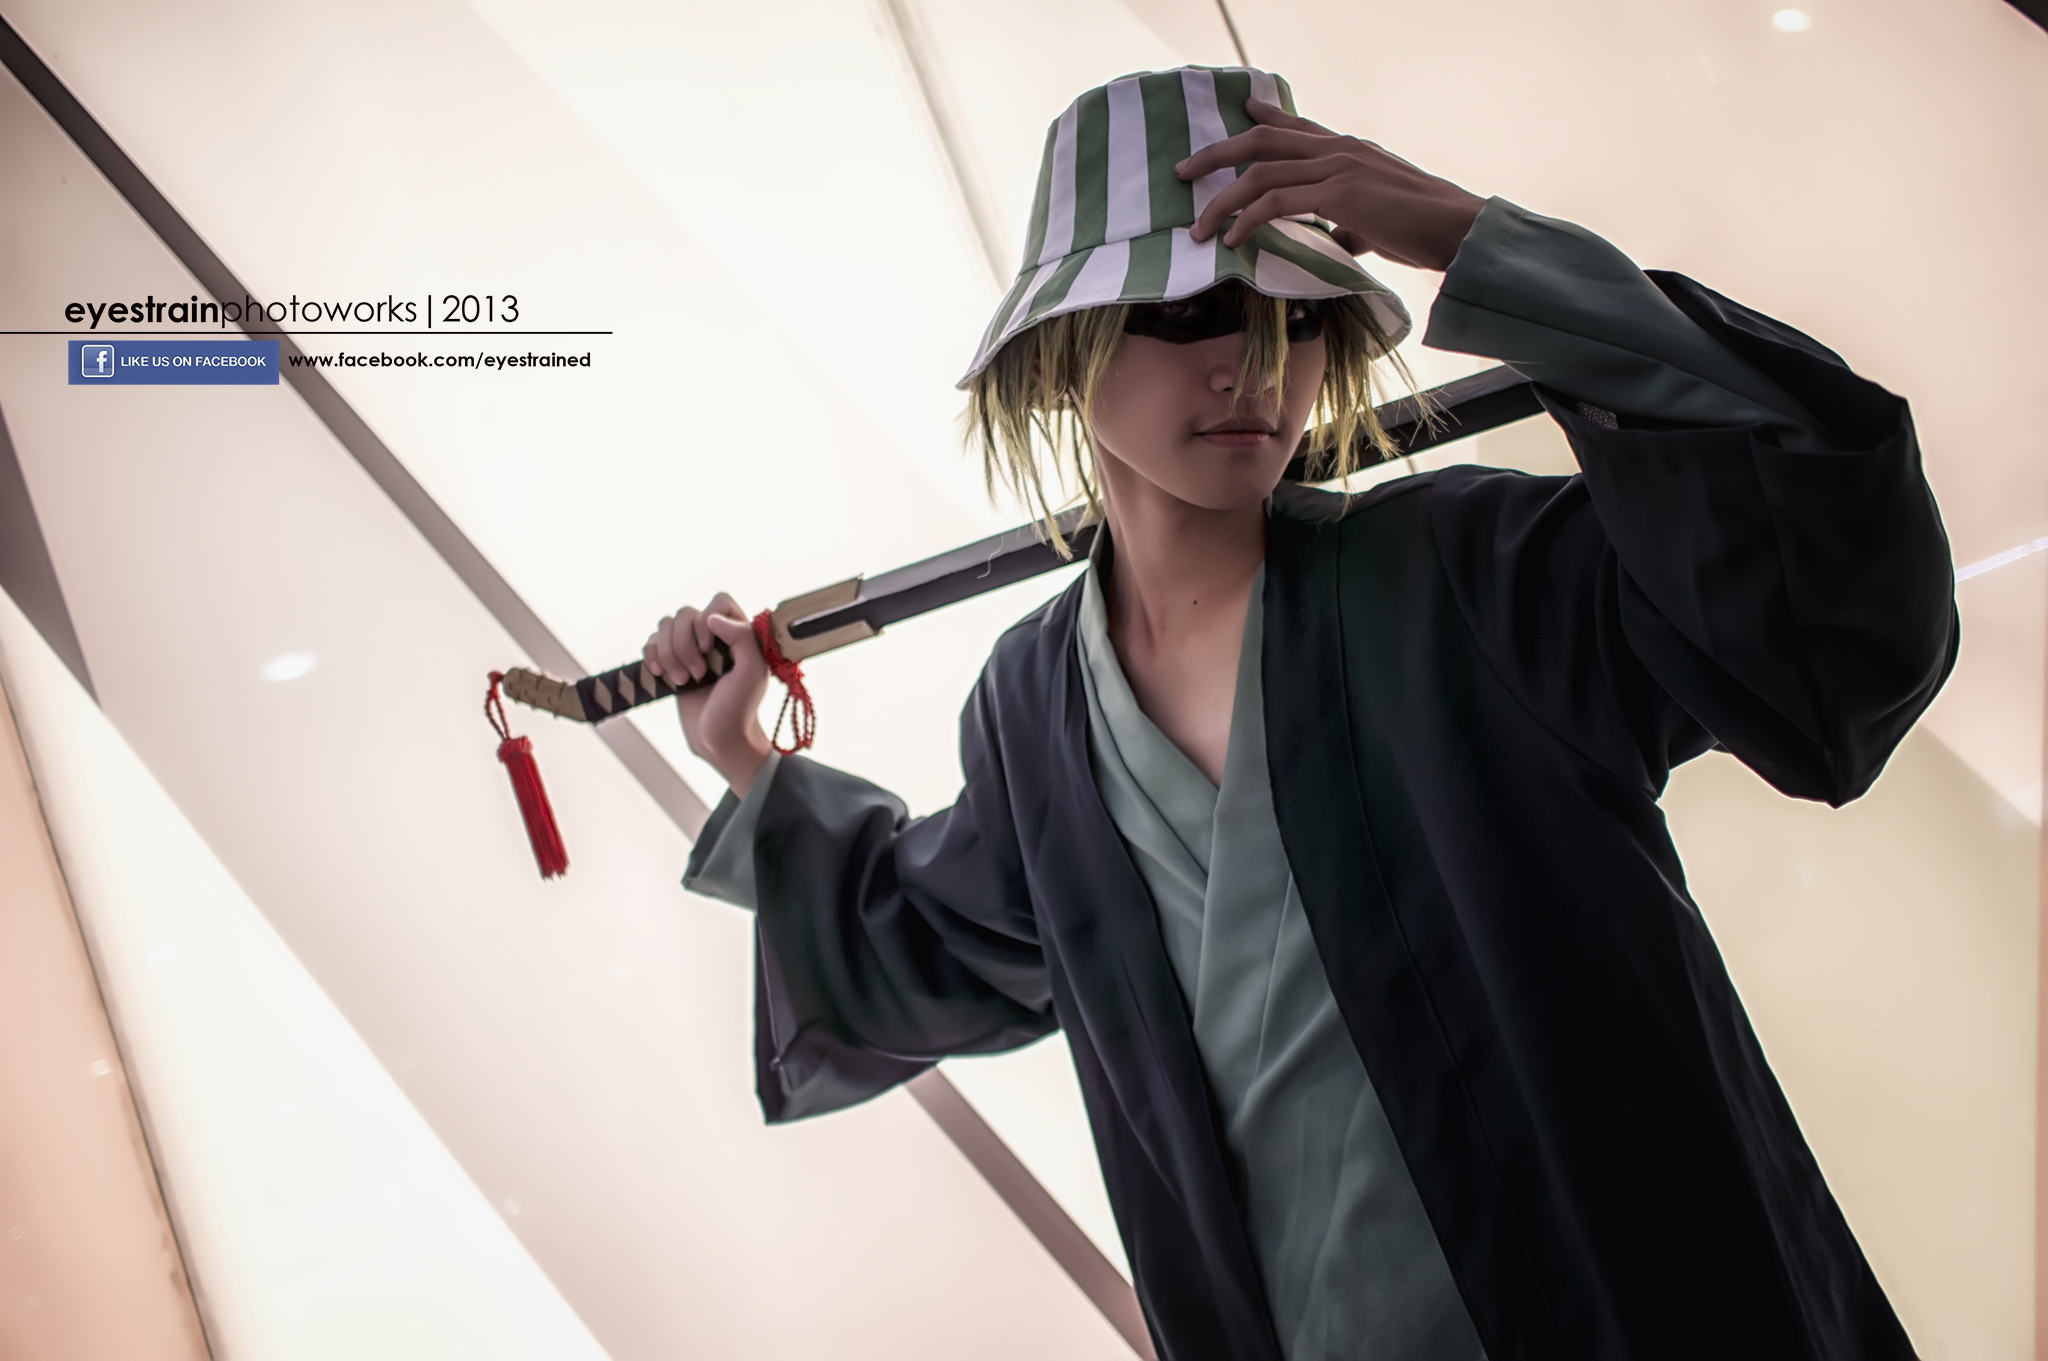 cosplay: Urahara Kisuke - Bleach by riskbreaker on DeviantArt